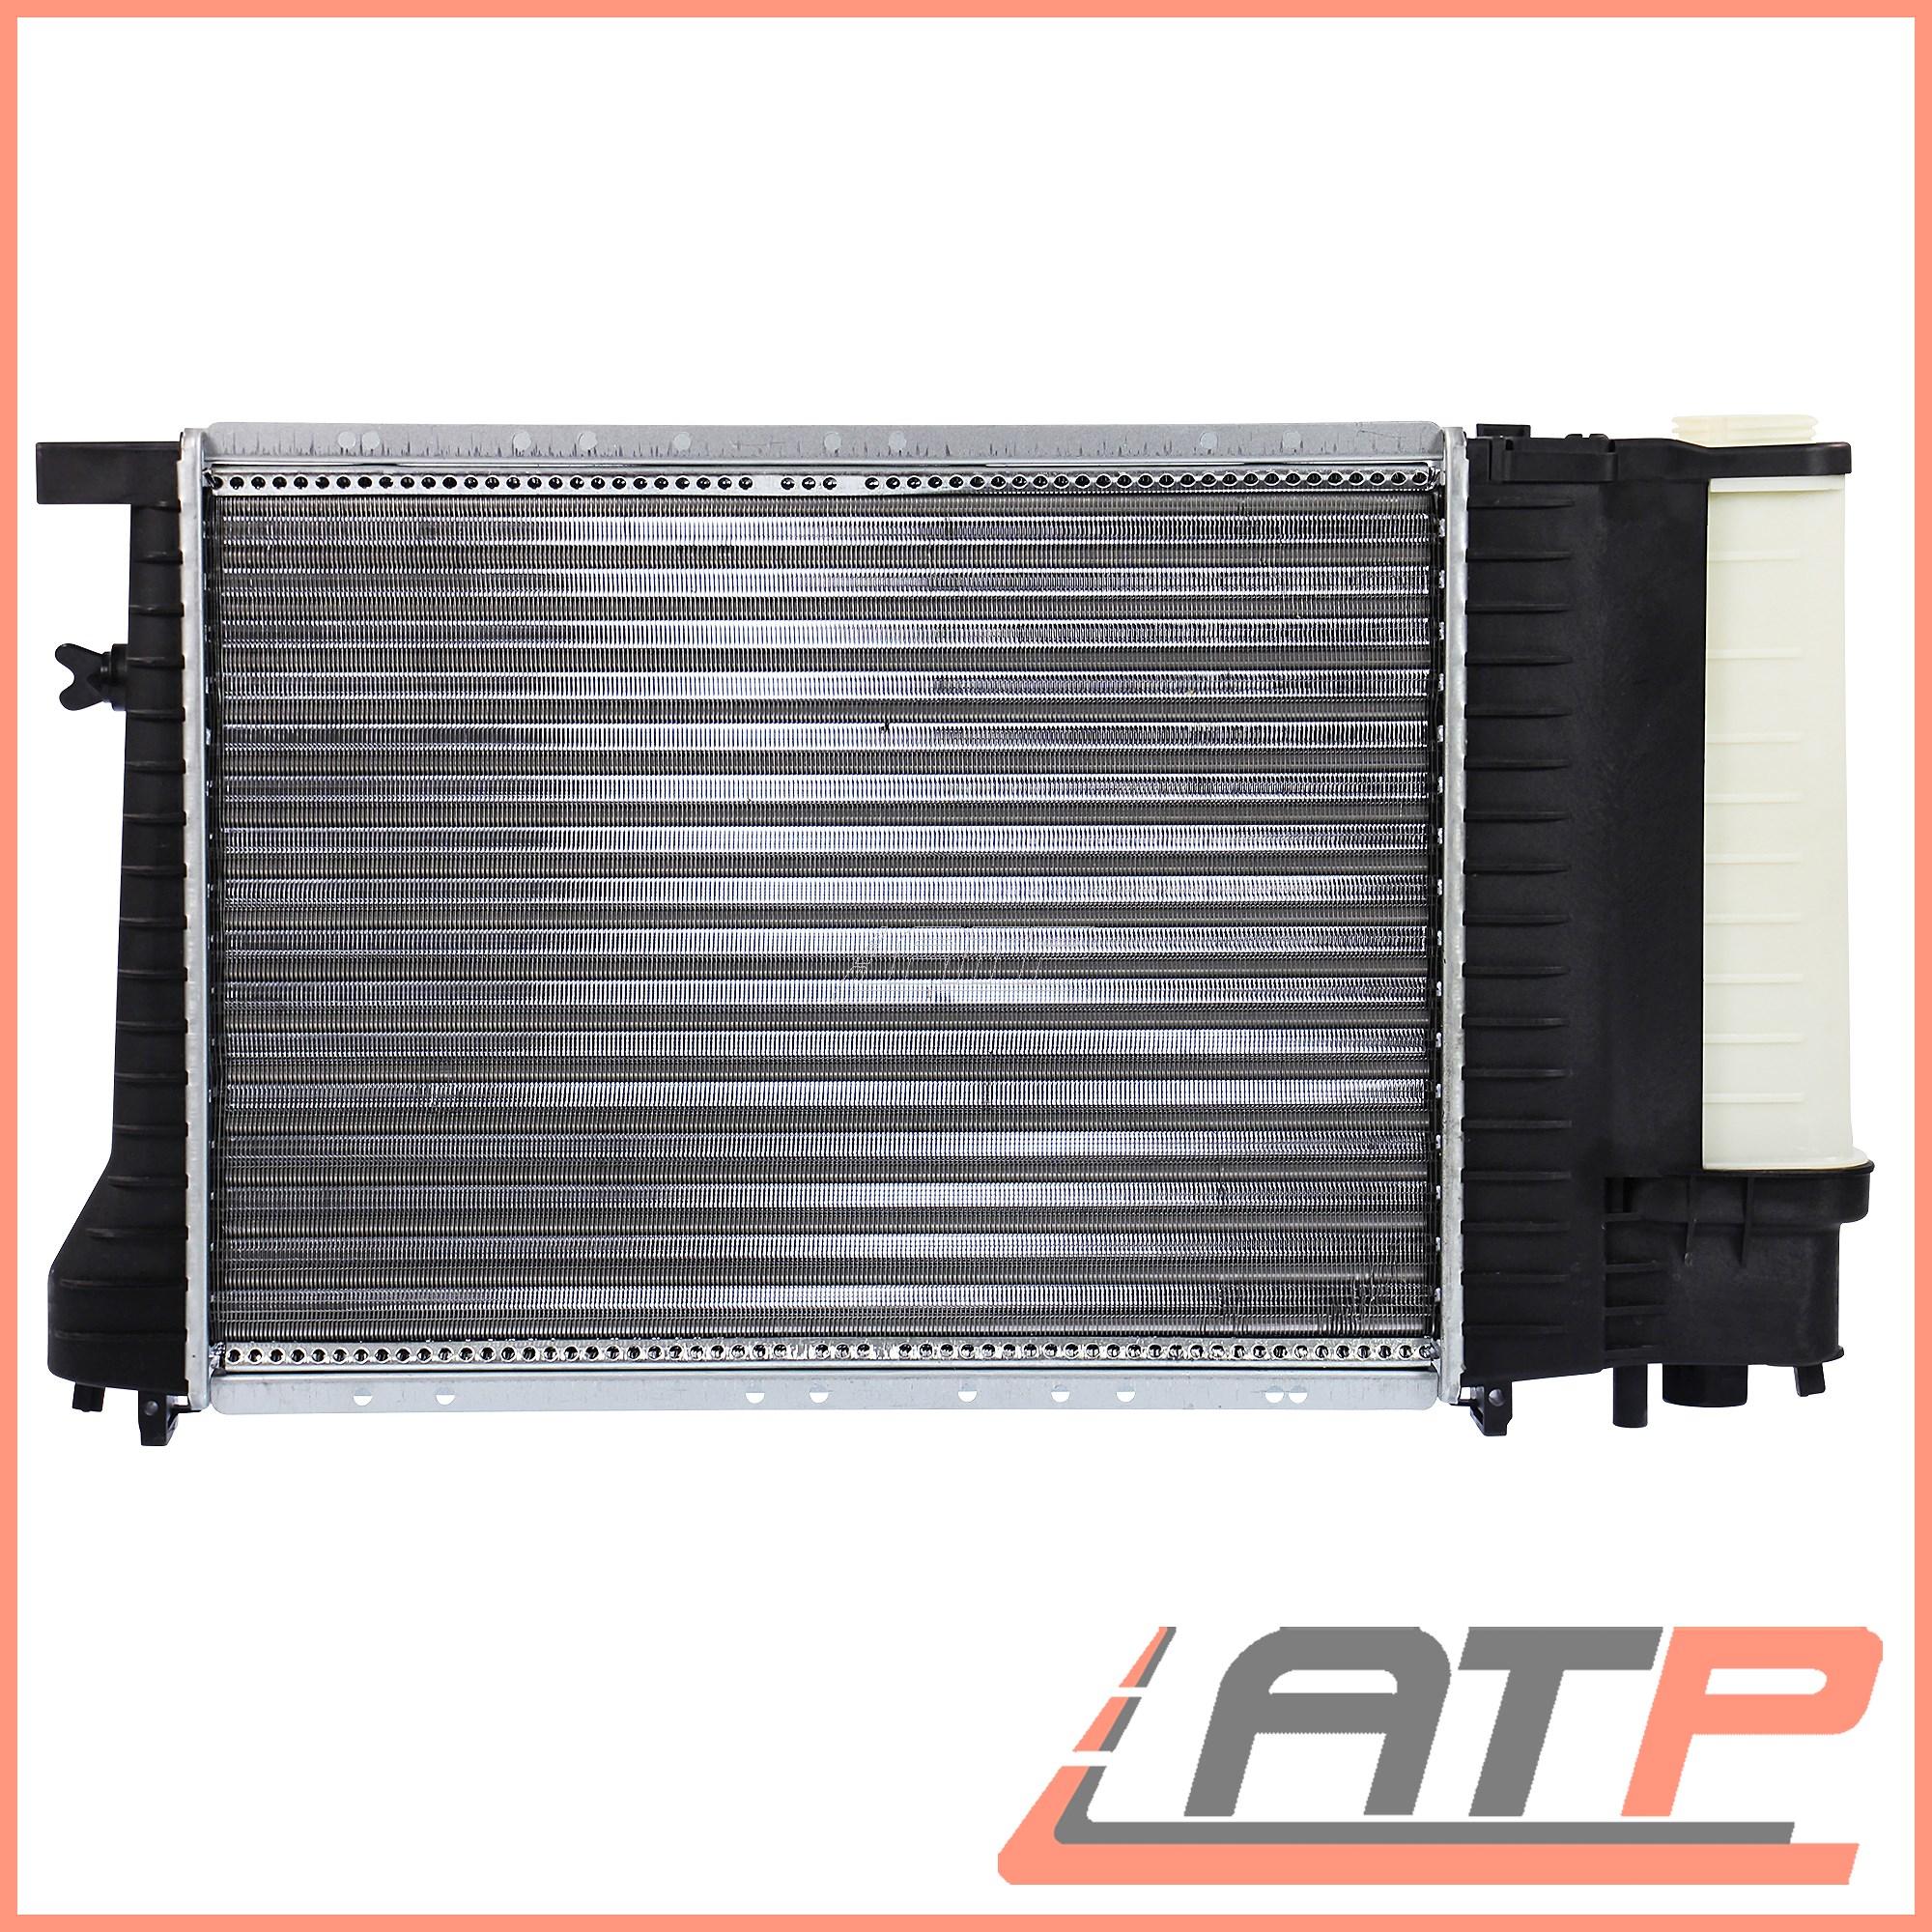 ENGINE-COOLER-RADIATOR-BMW-3-SERIES-E36-E30-318i-328i-E34-5-SERIES-518i-525i thumbnail 2